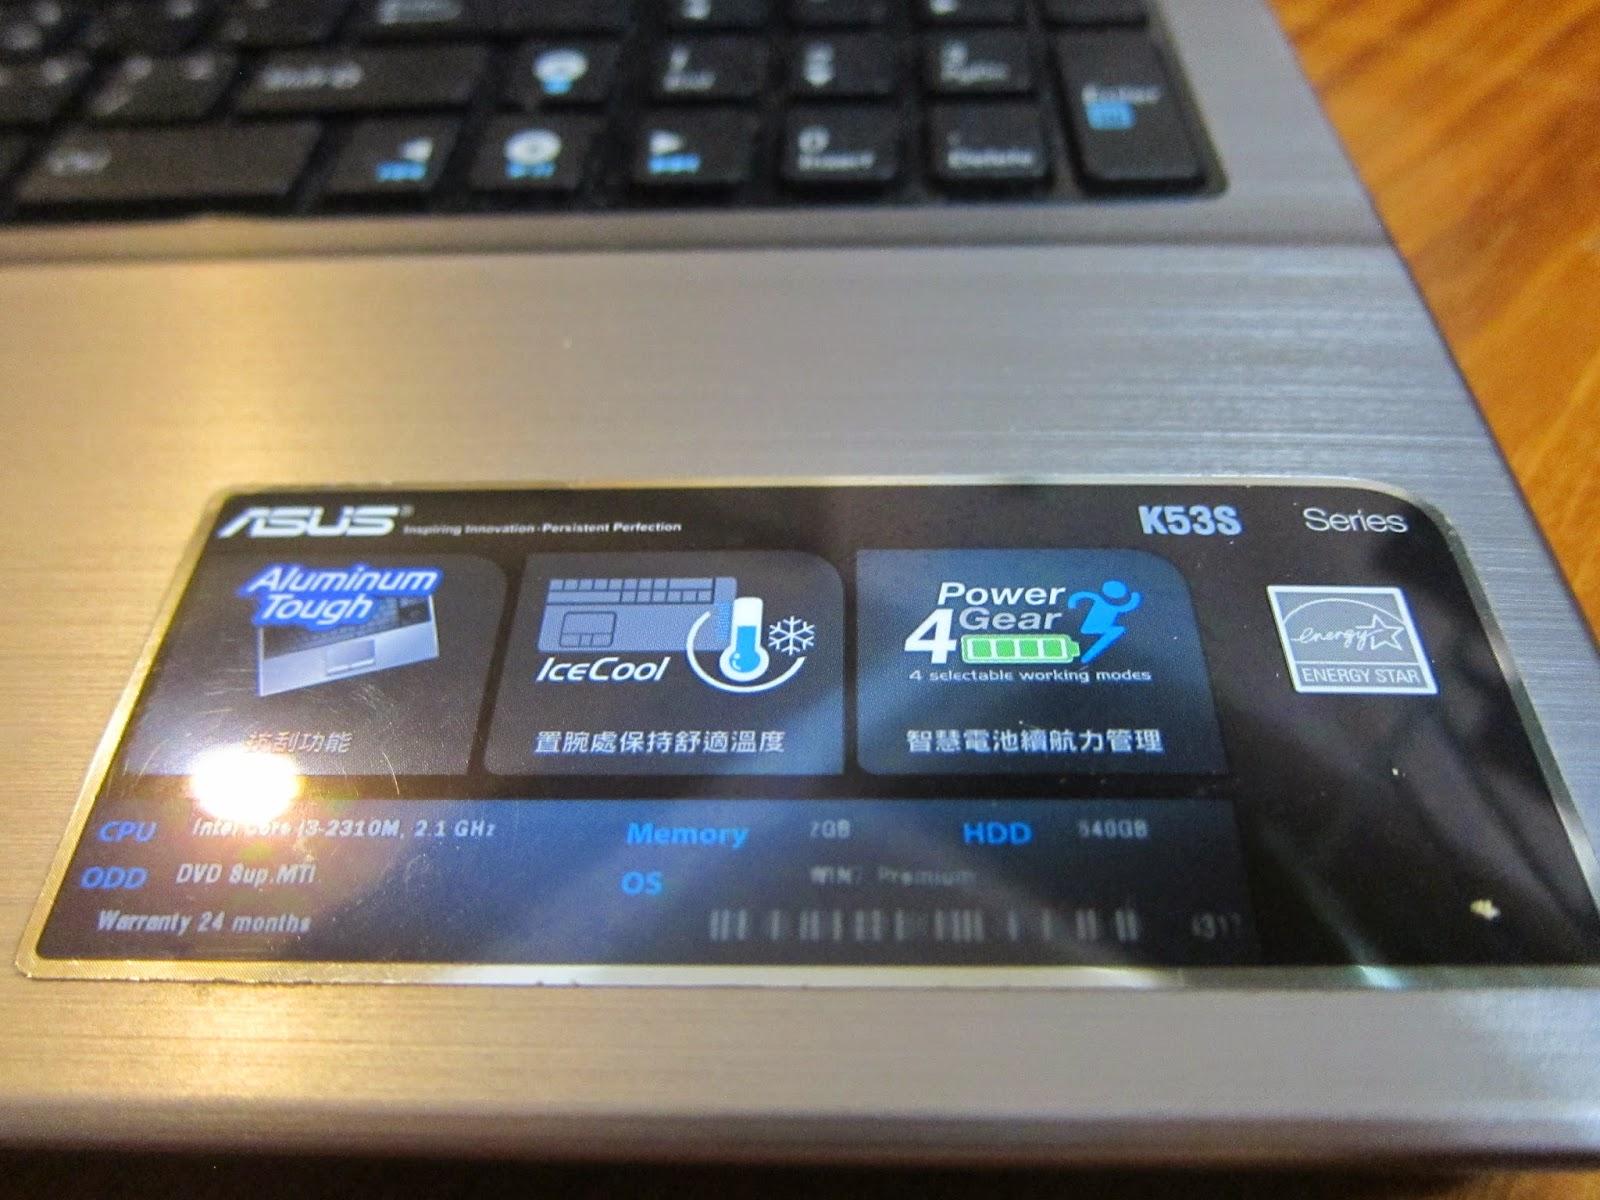 IMG 2341 - [開箱] ASUS K53SJ 15.6吋的耐用效能機